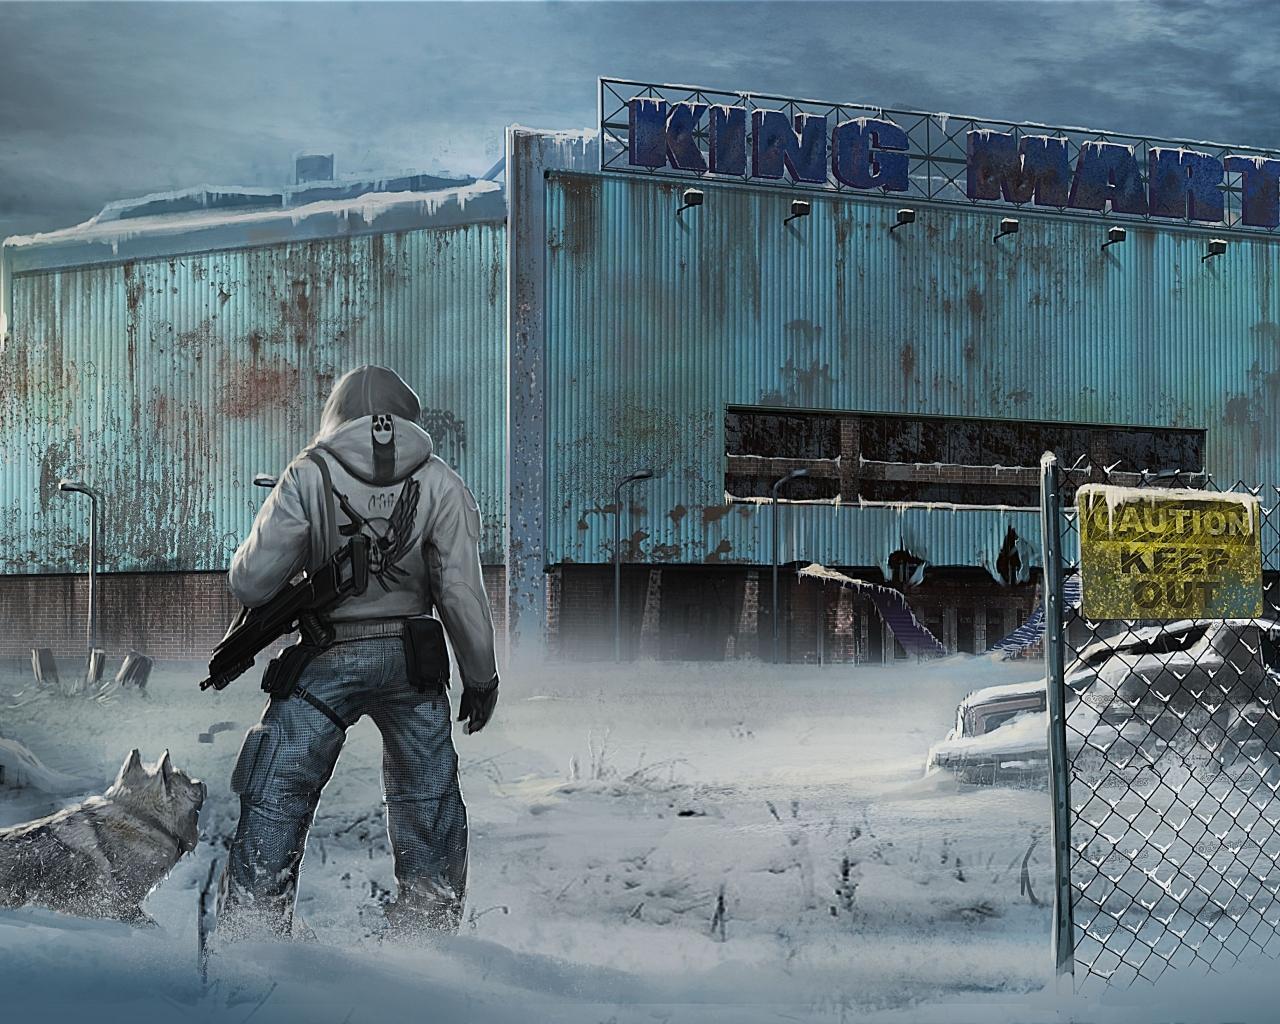 1280x1024 The Last Of Us City Winter 1280x1024 Resolution